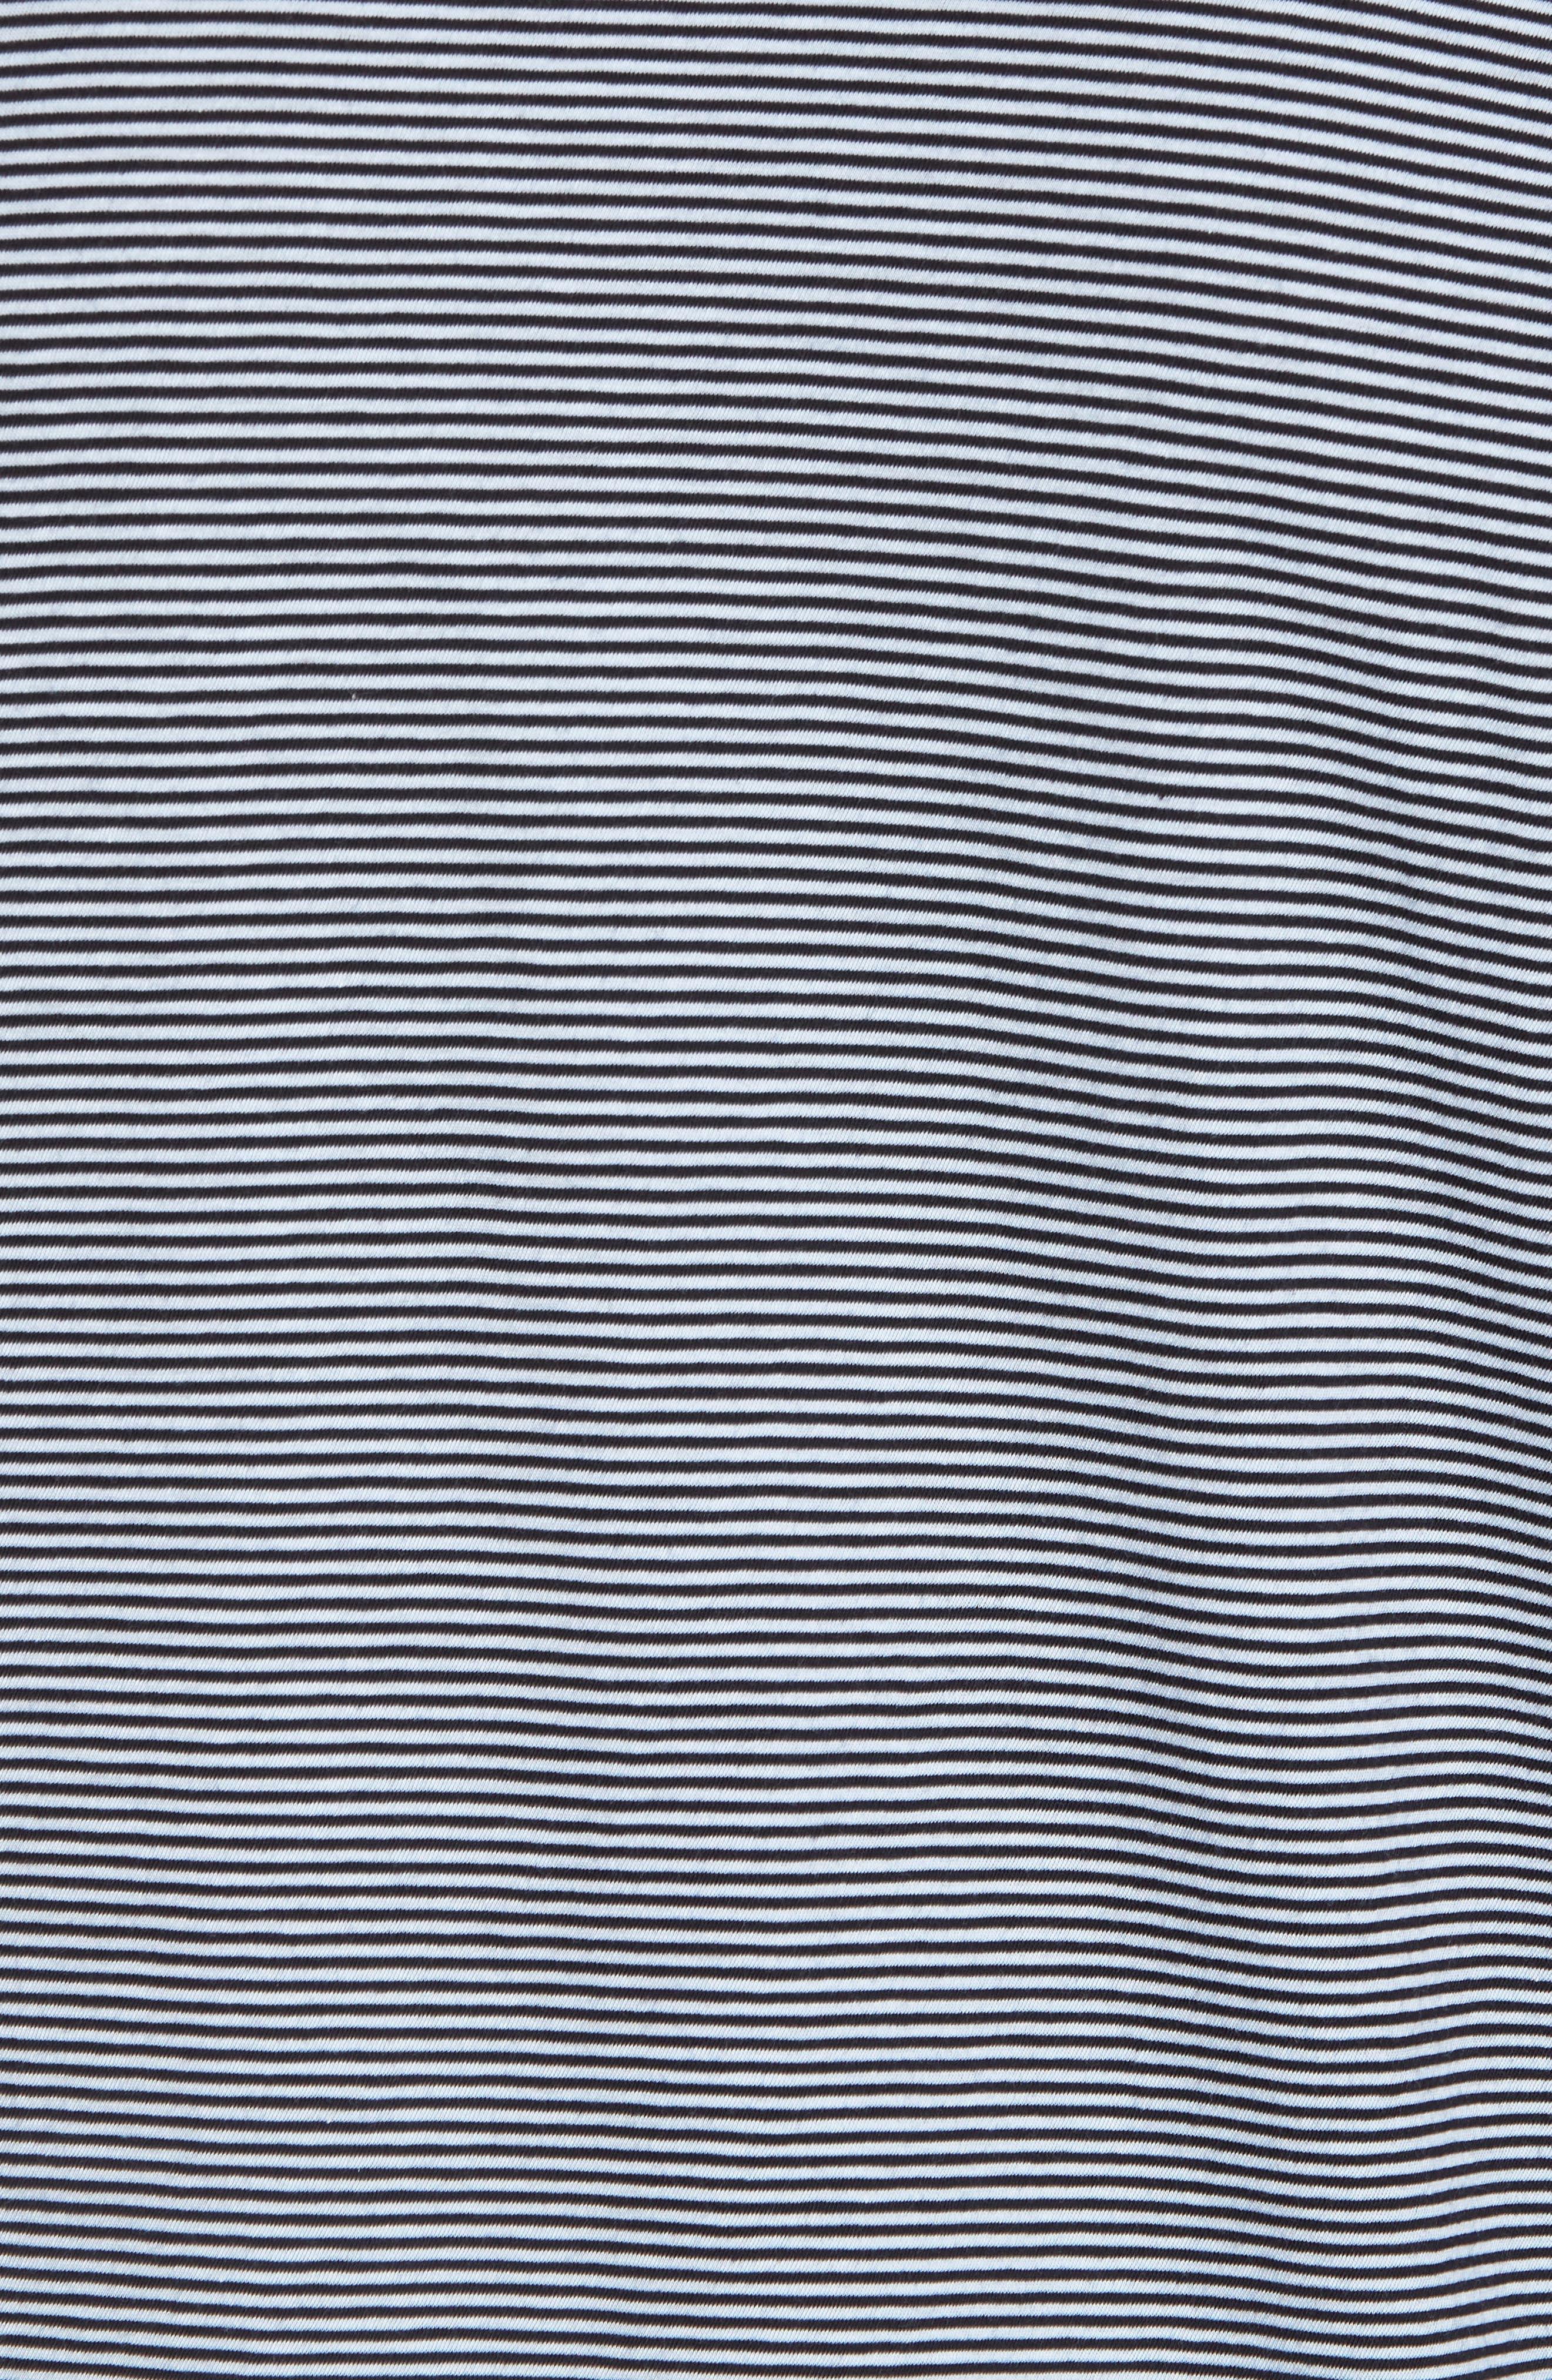 Slim Fit Stripe Pocket T-Shirt,                             Alternate thumbnail 7, color,                             New Coastal/ Feather